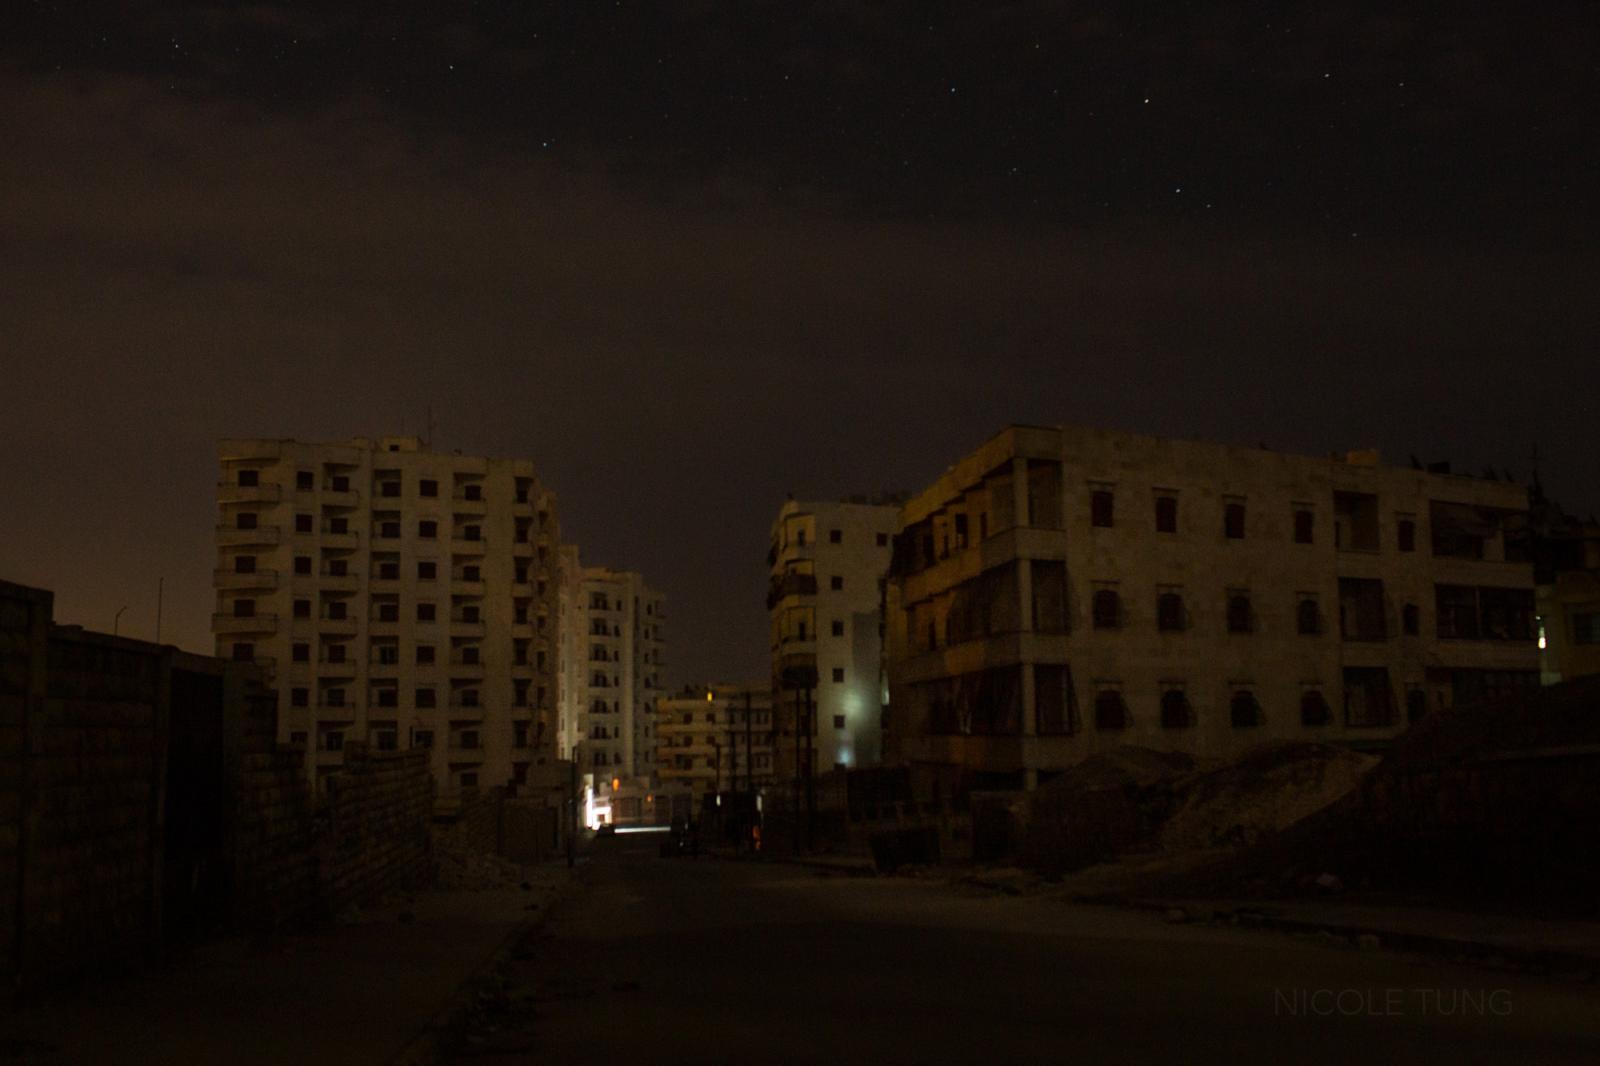 Photography image - Loading NT-SyriaLongNight_02.jpg